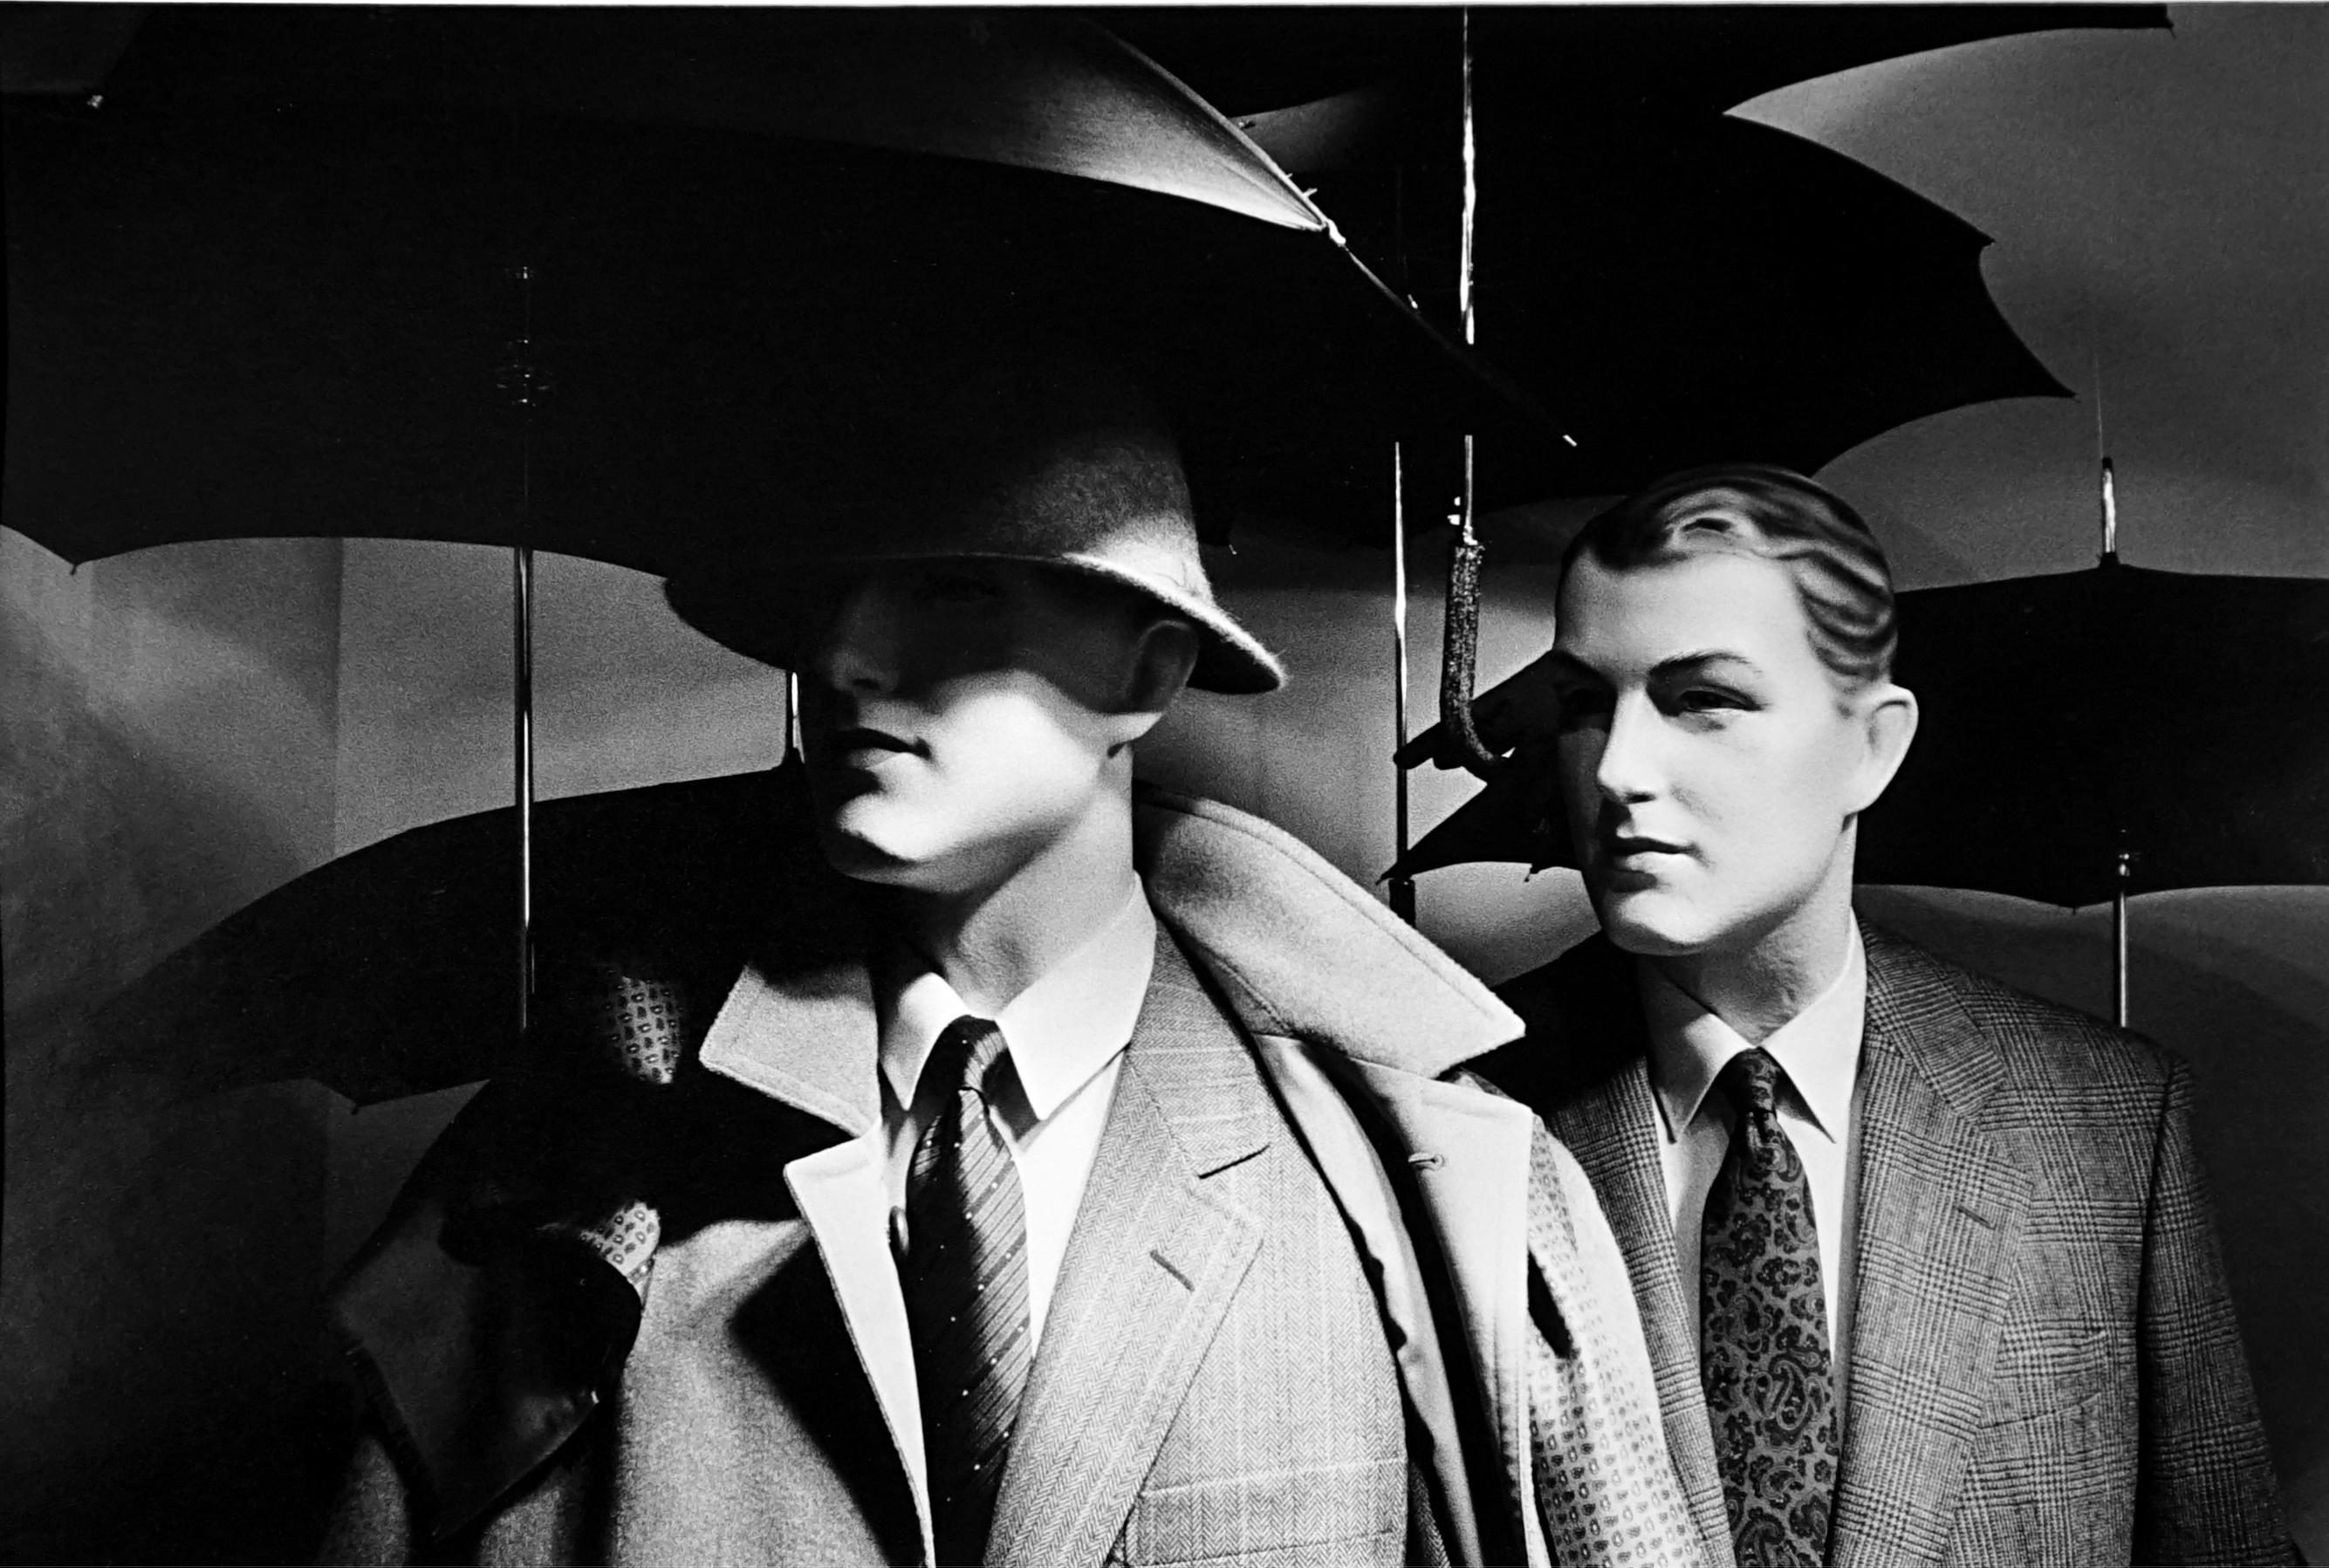 Au chic Parisien - Off-Print # 1  - 1981 - Minimalist Black & White Photography